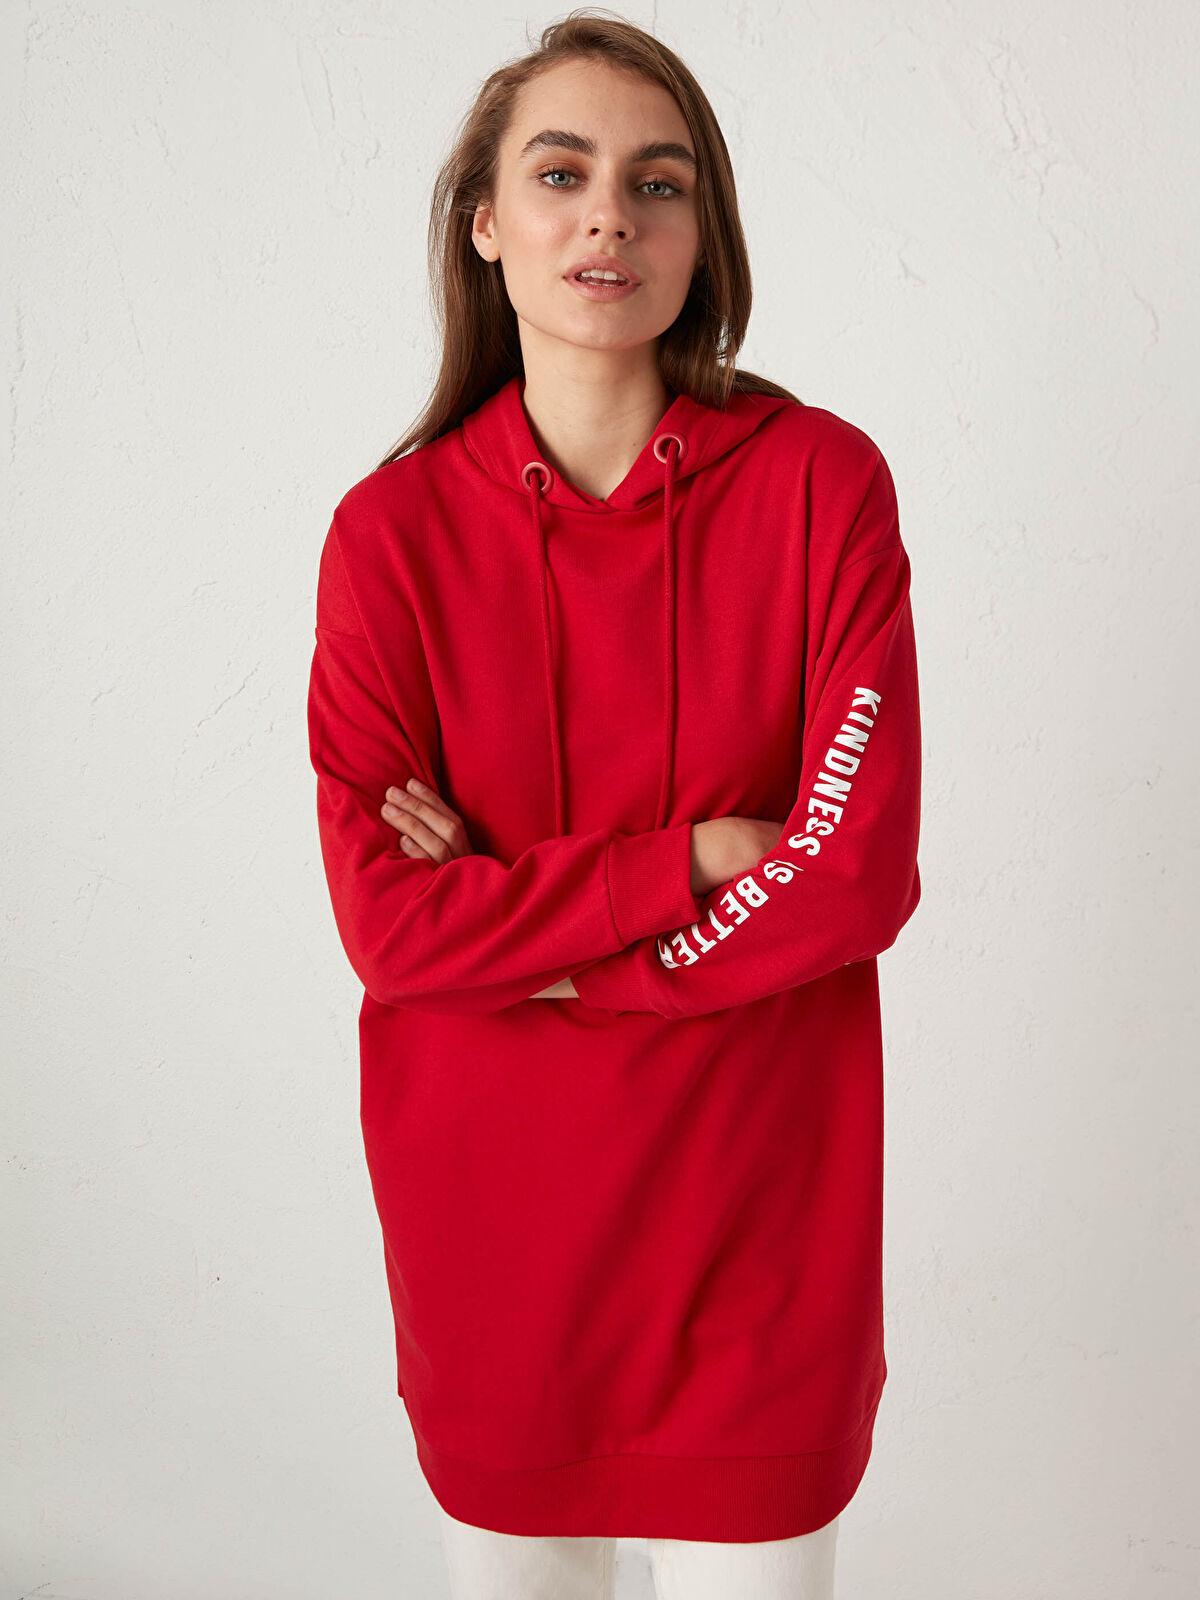 Kapüşonlu Yazı Baskılı Sweatshirt - LC WAIKIKI